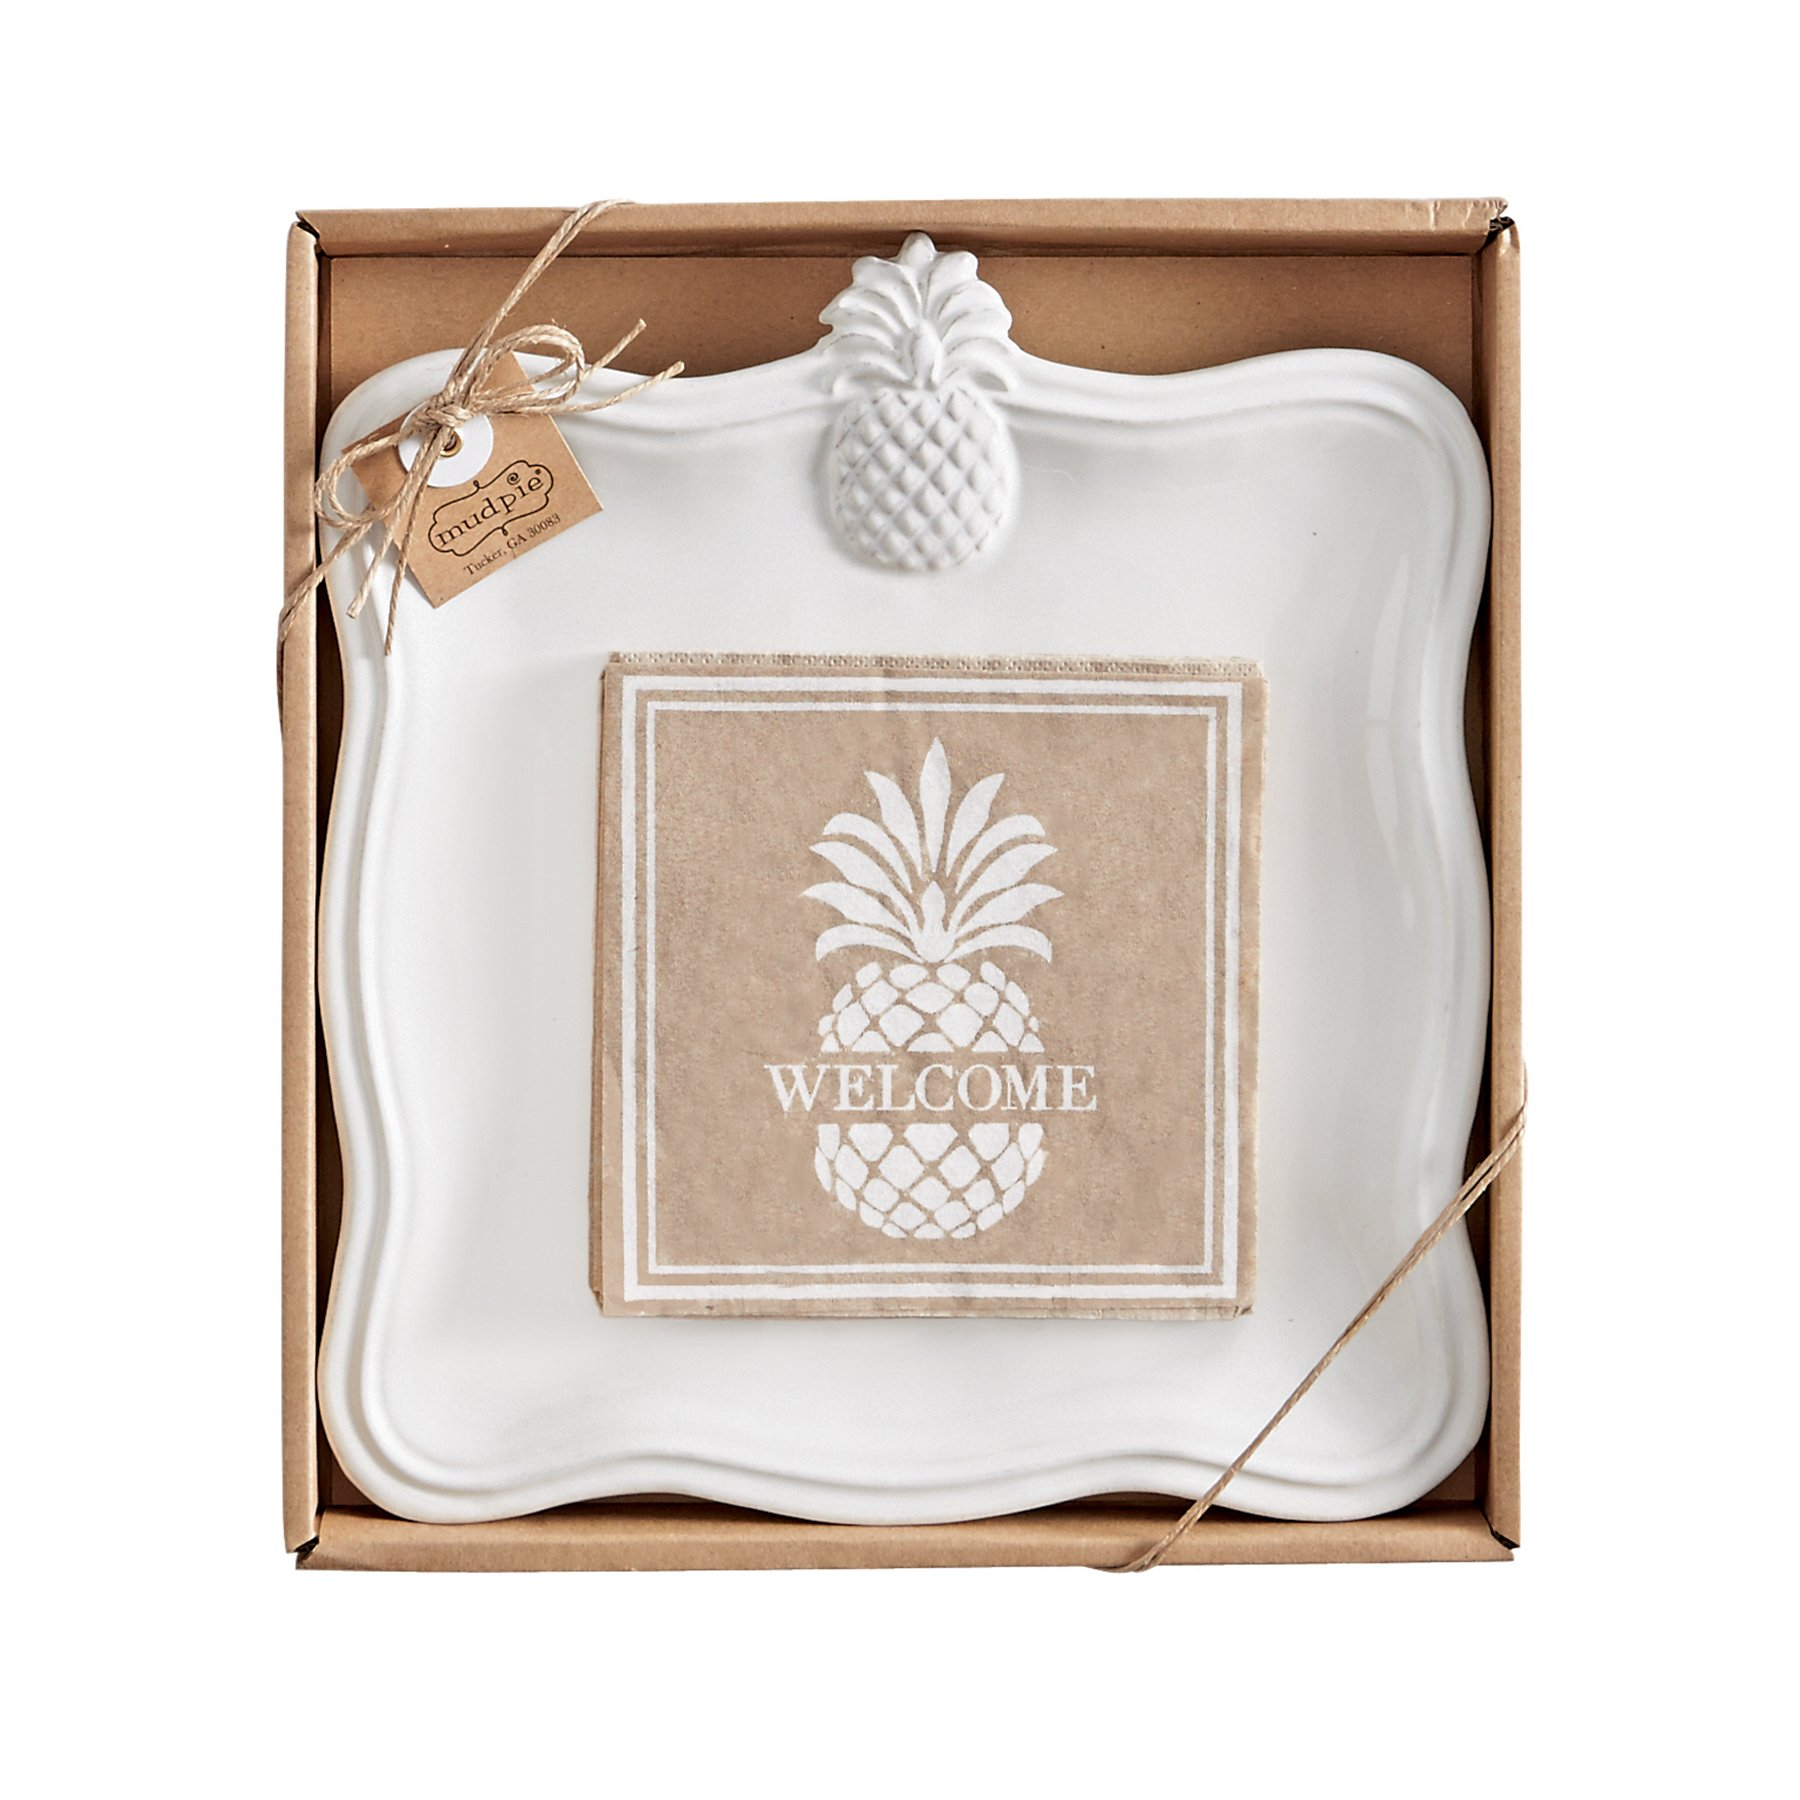 Mud Pie 4115022 Pineapple Cheese Serving Set, White